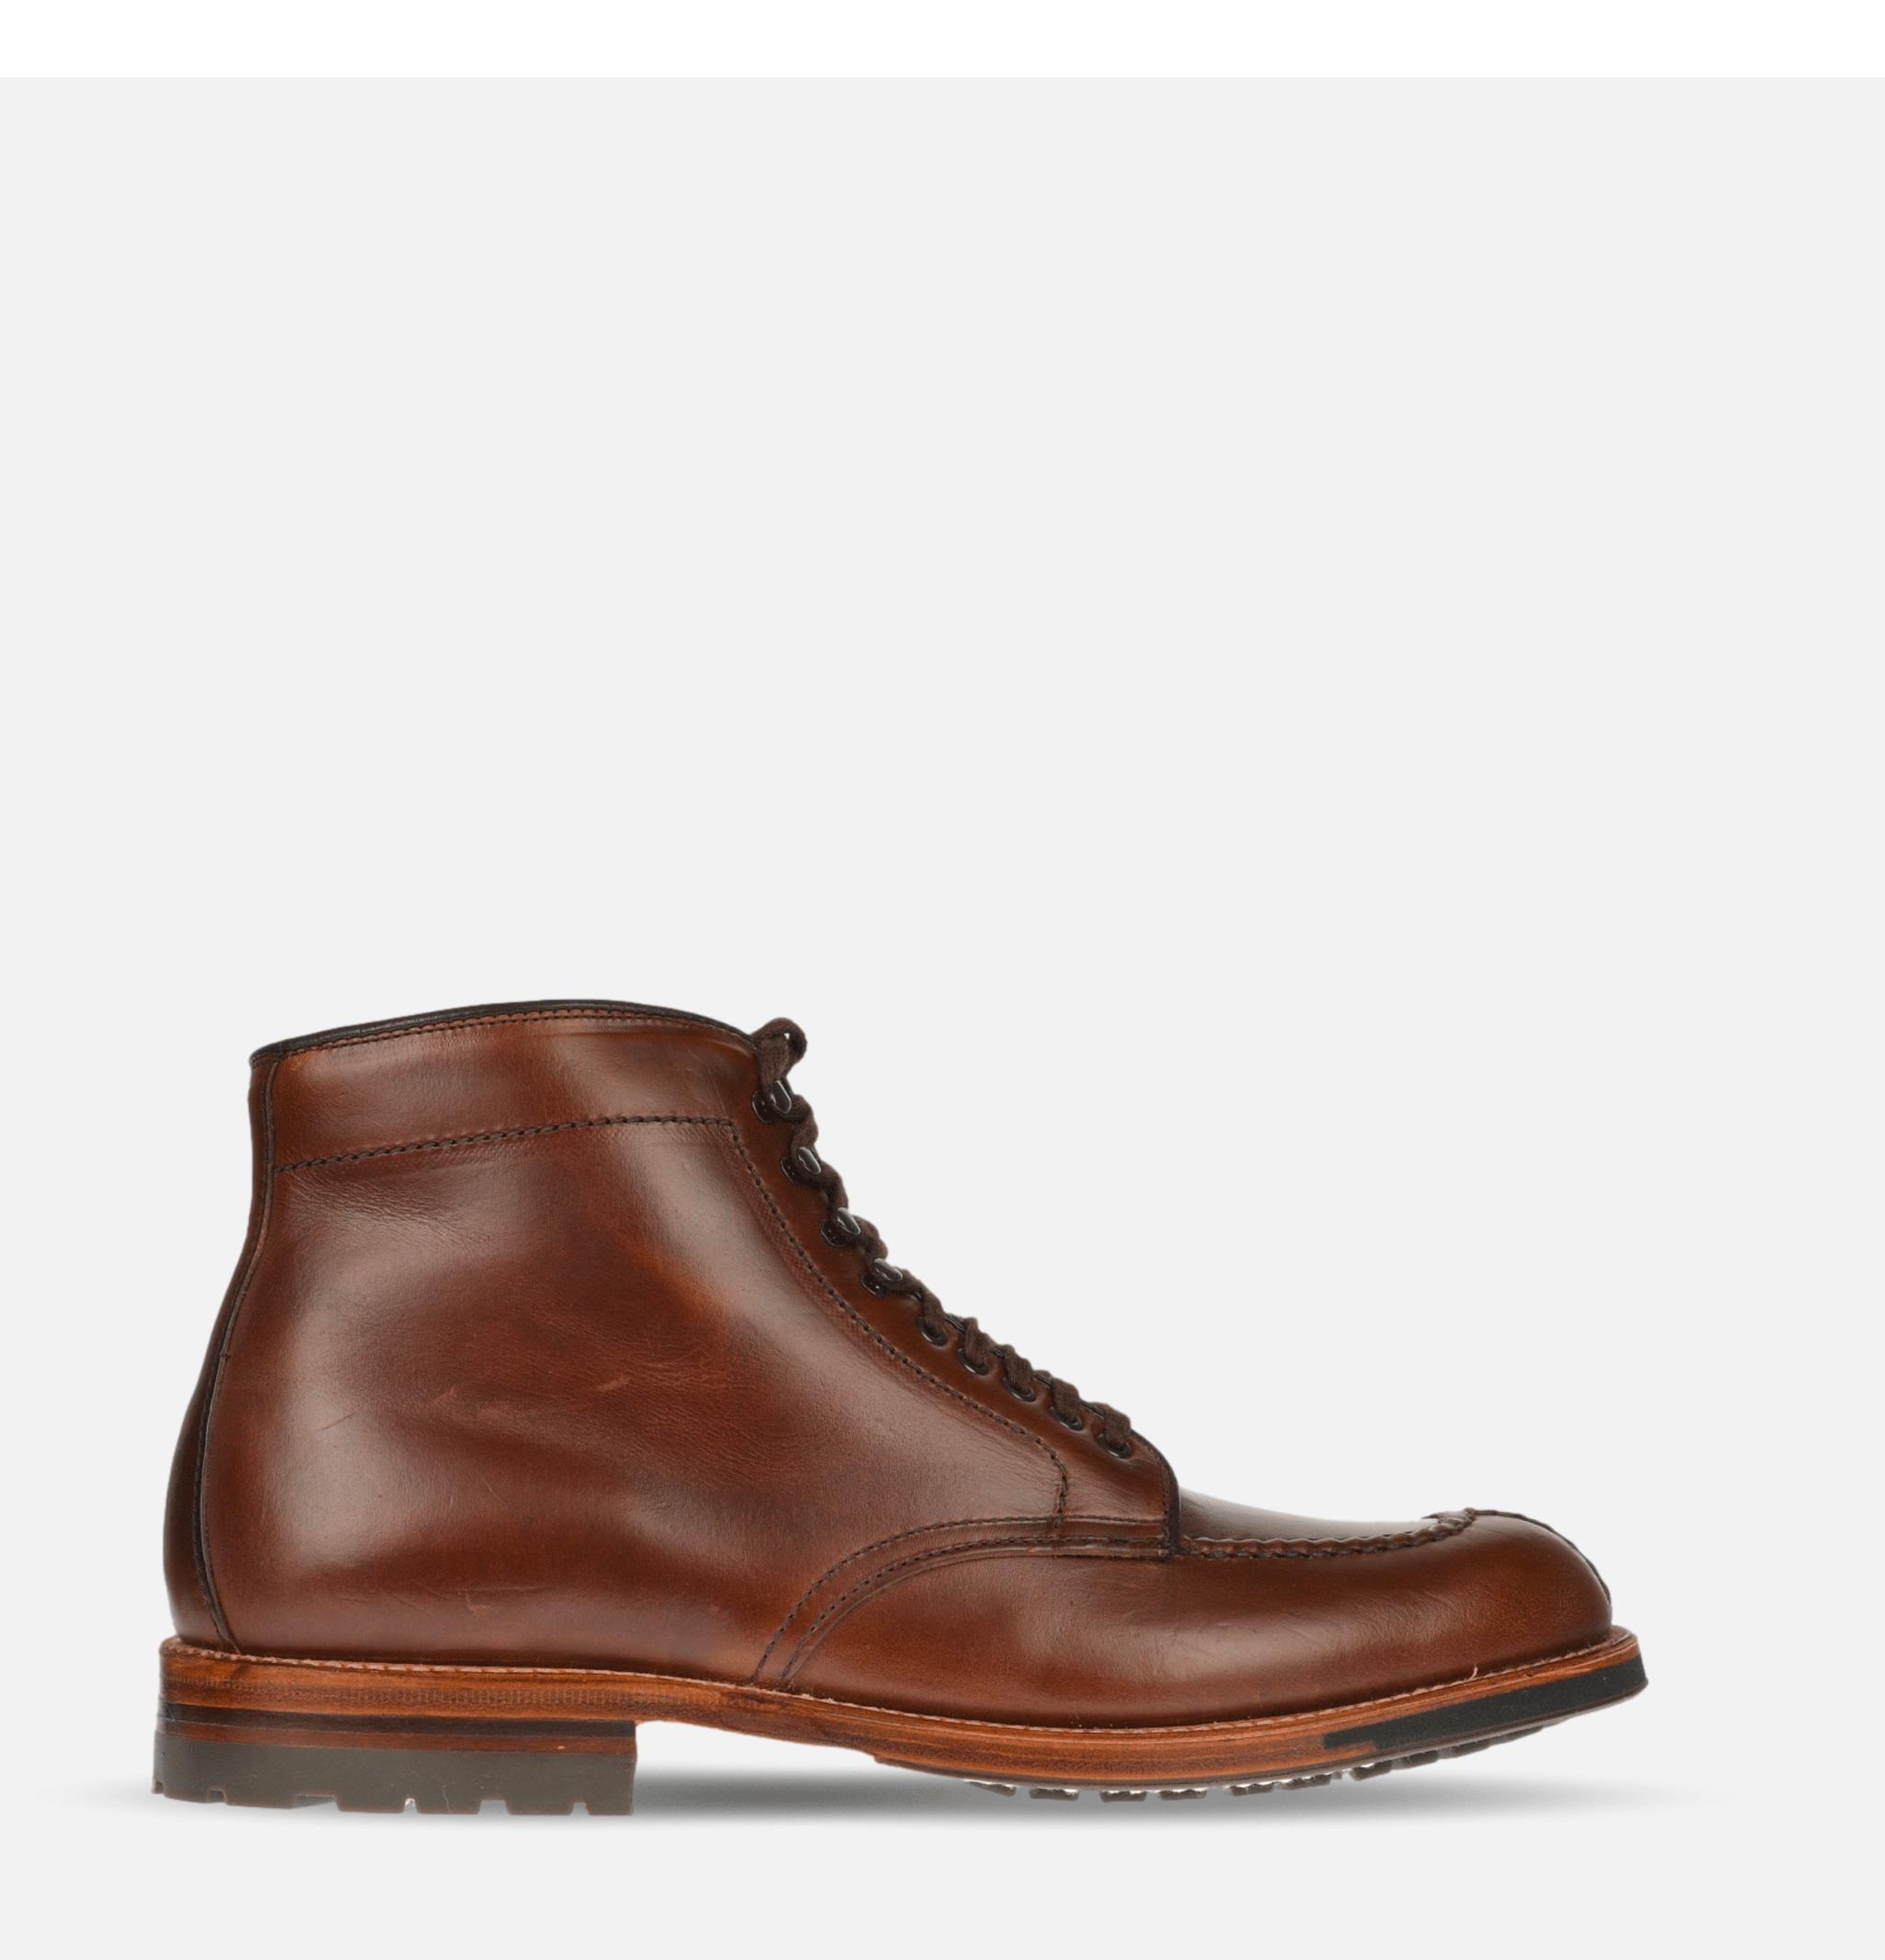 8908HC - Tanker Boots Brown